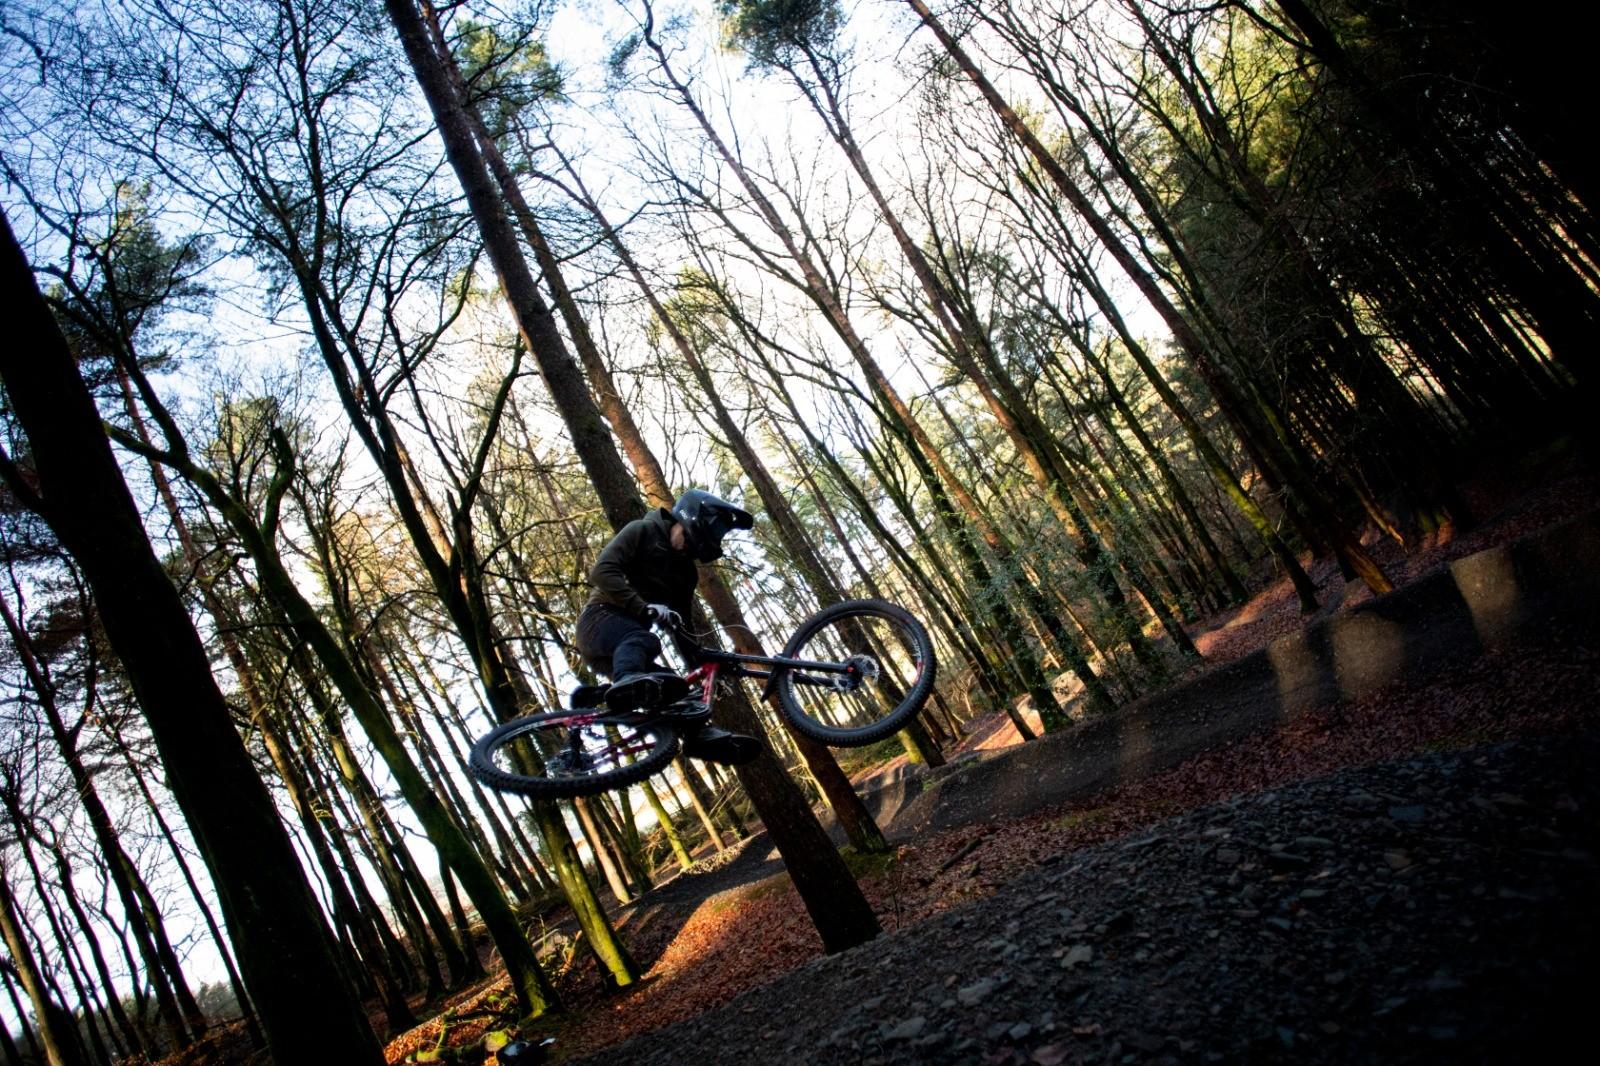 D48B3C1F-E0C1-4F0A-A8A7-AA38A5C1DAC2 - martin dunn - Mountain Biking Pictures - Vital MTB